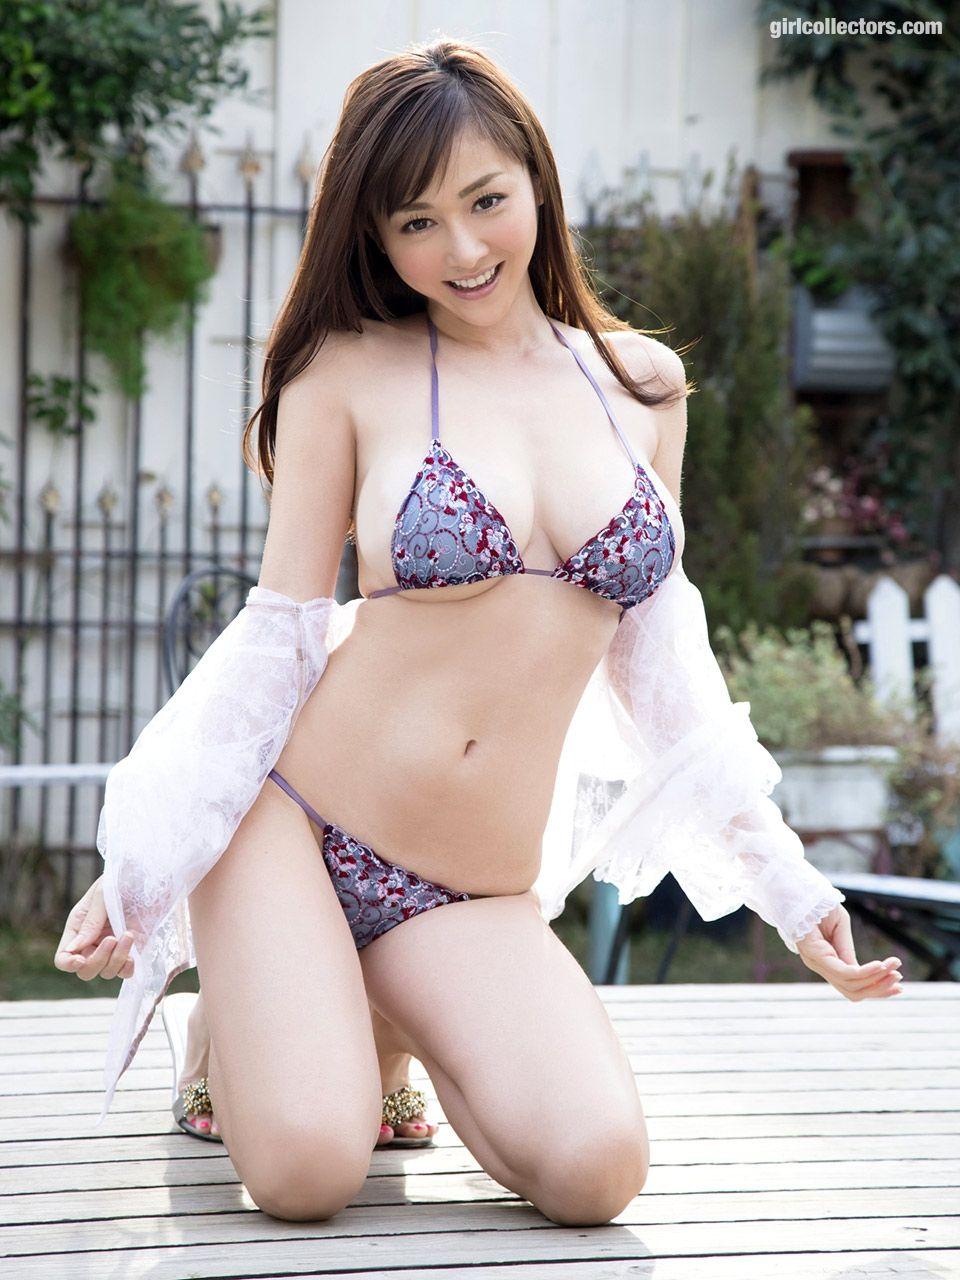 Snapchat Anri Sugihara nude photos 2019